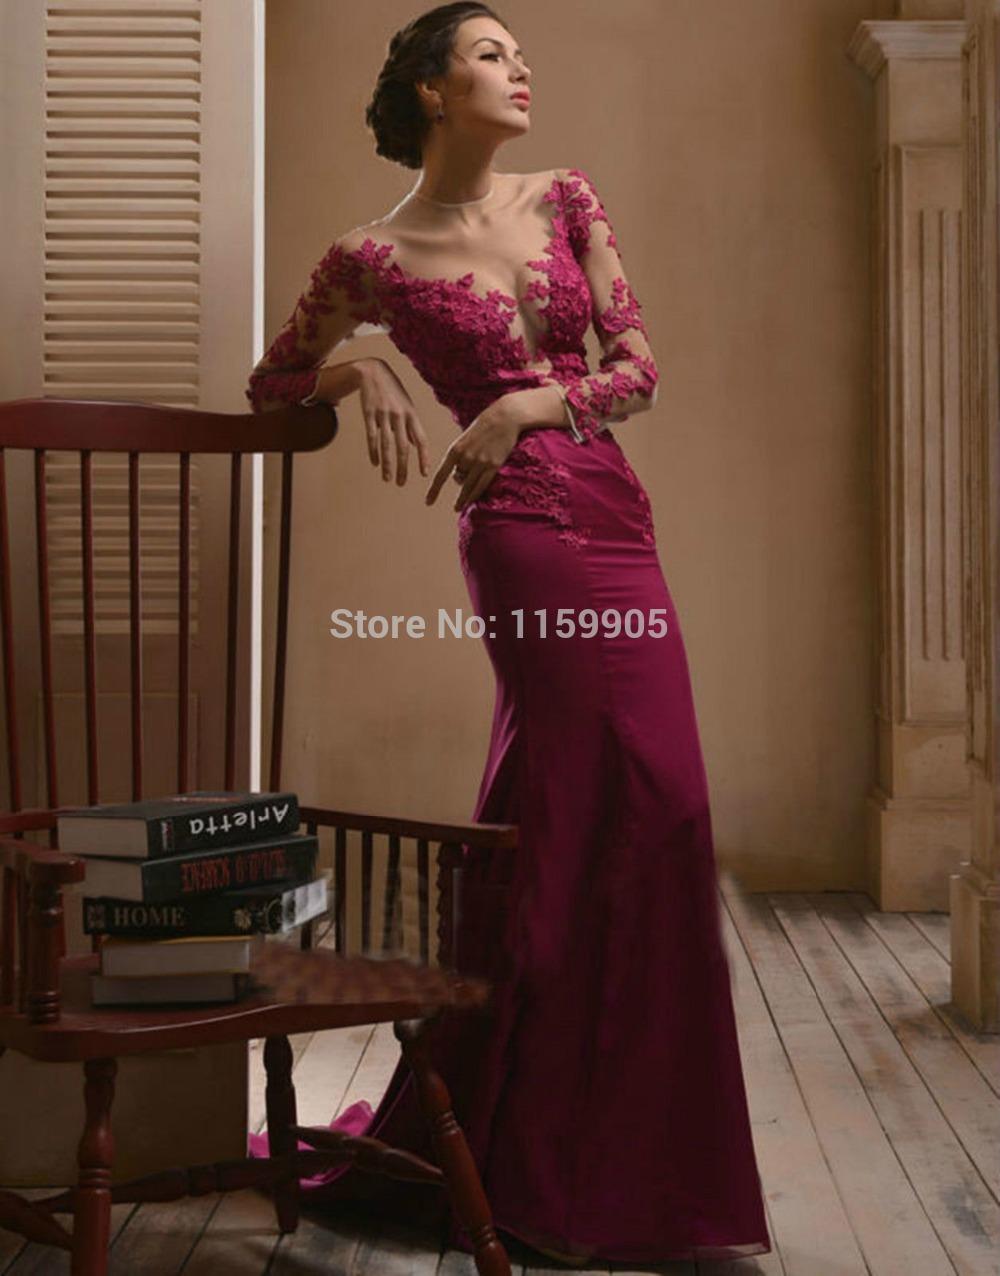 Rental clothing online